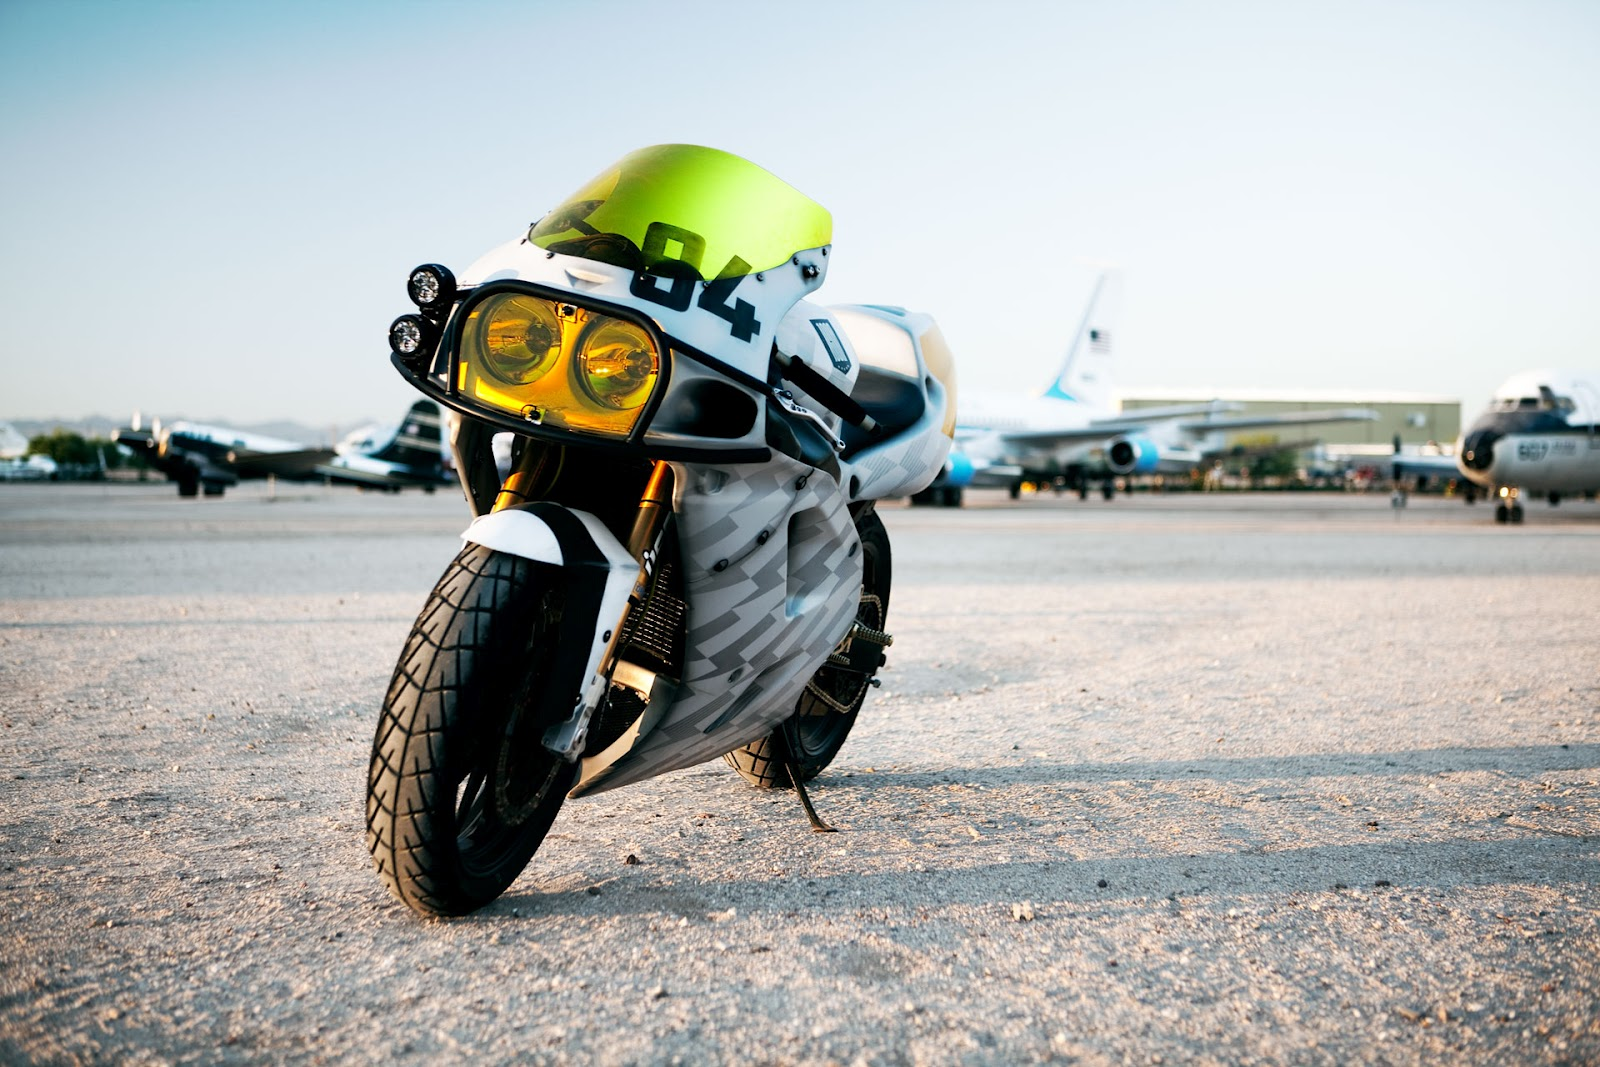 Return of the Cafe Racers - Kawasaki ZX-7 Thunder Chunky